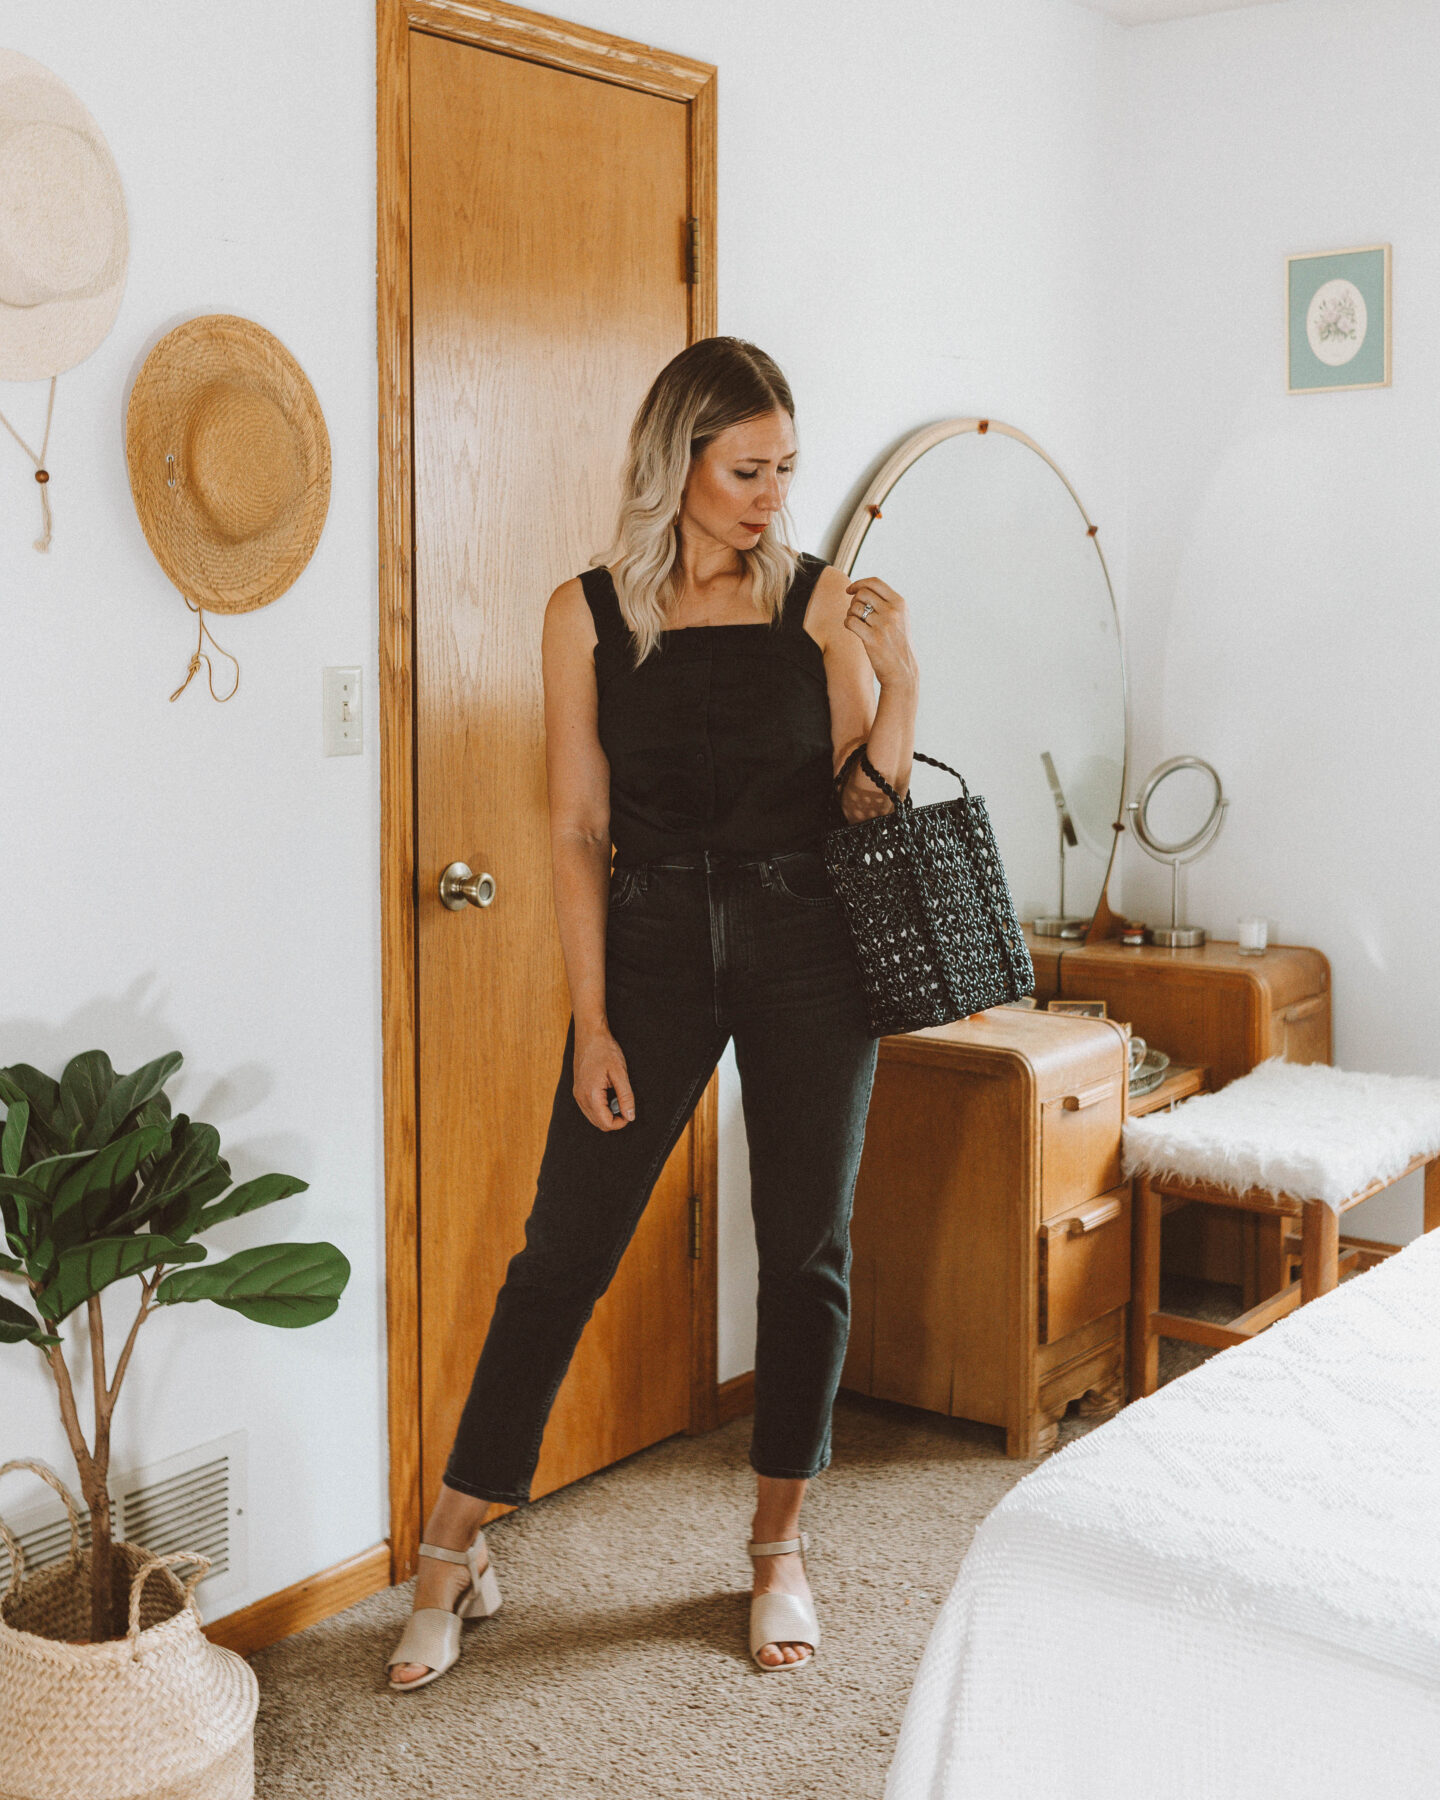 A Week of Summer Outfit Ideas, everlane choose what you pay, bootcut cheeky jean review, linen apron top review, block heel sandal, bembien jolene mini black